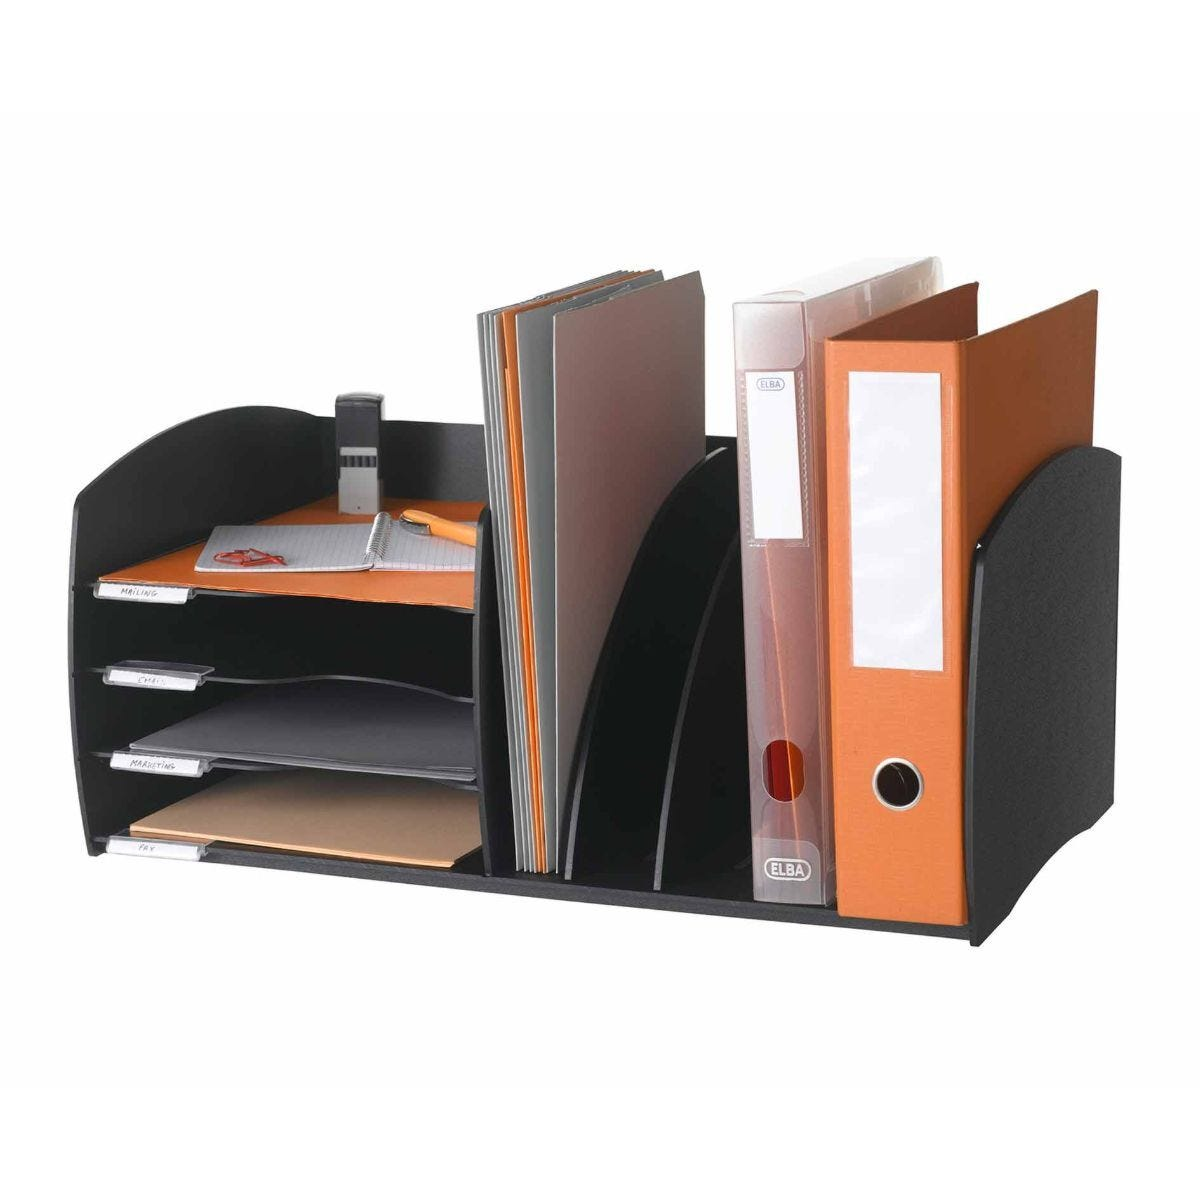 Fast Paper 4 Compartment Desk Organiser Black